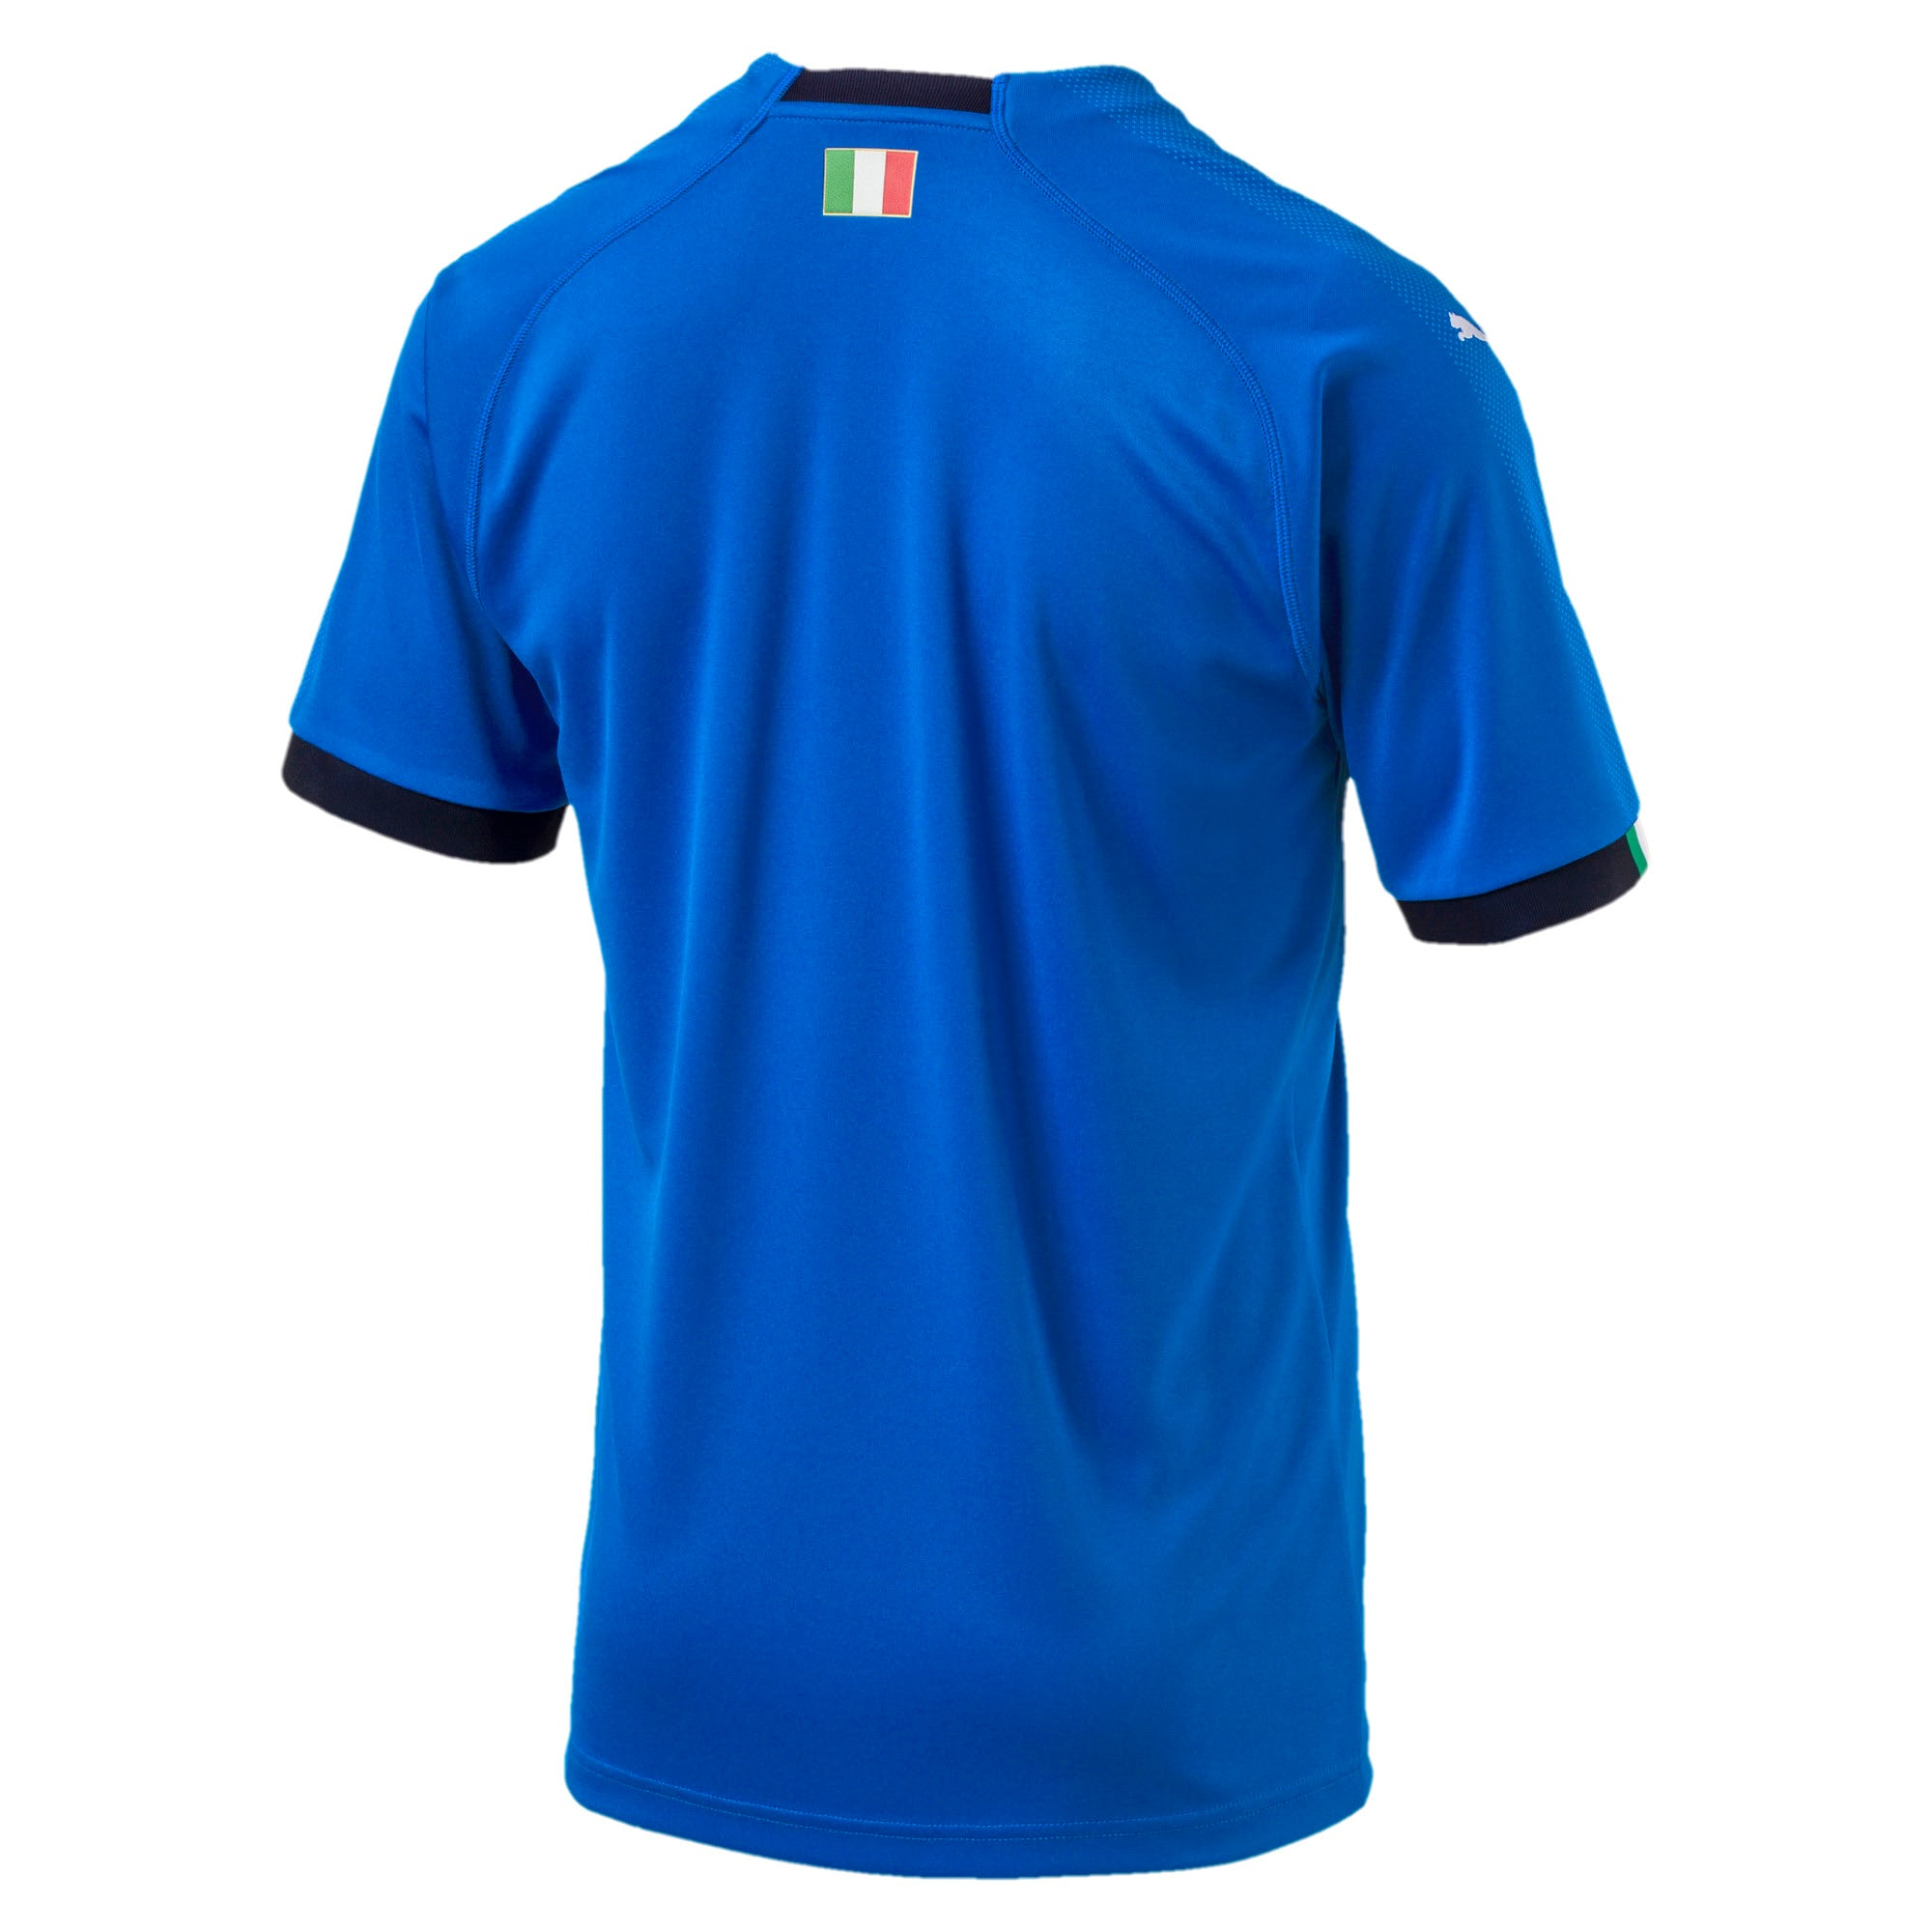 Thumbnail 5 of FIGC ITALIA HOME SHIRT REPLICA, Team Power Blue-Peacoat, medium-JPN